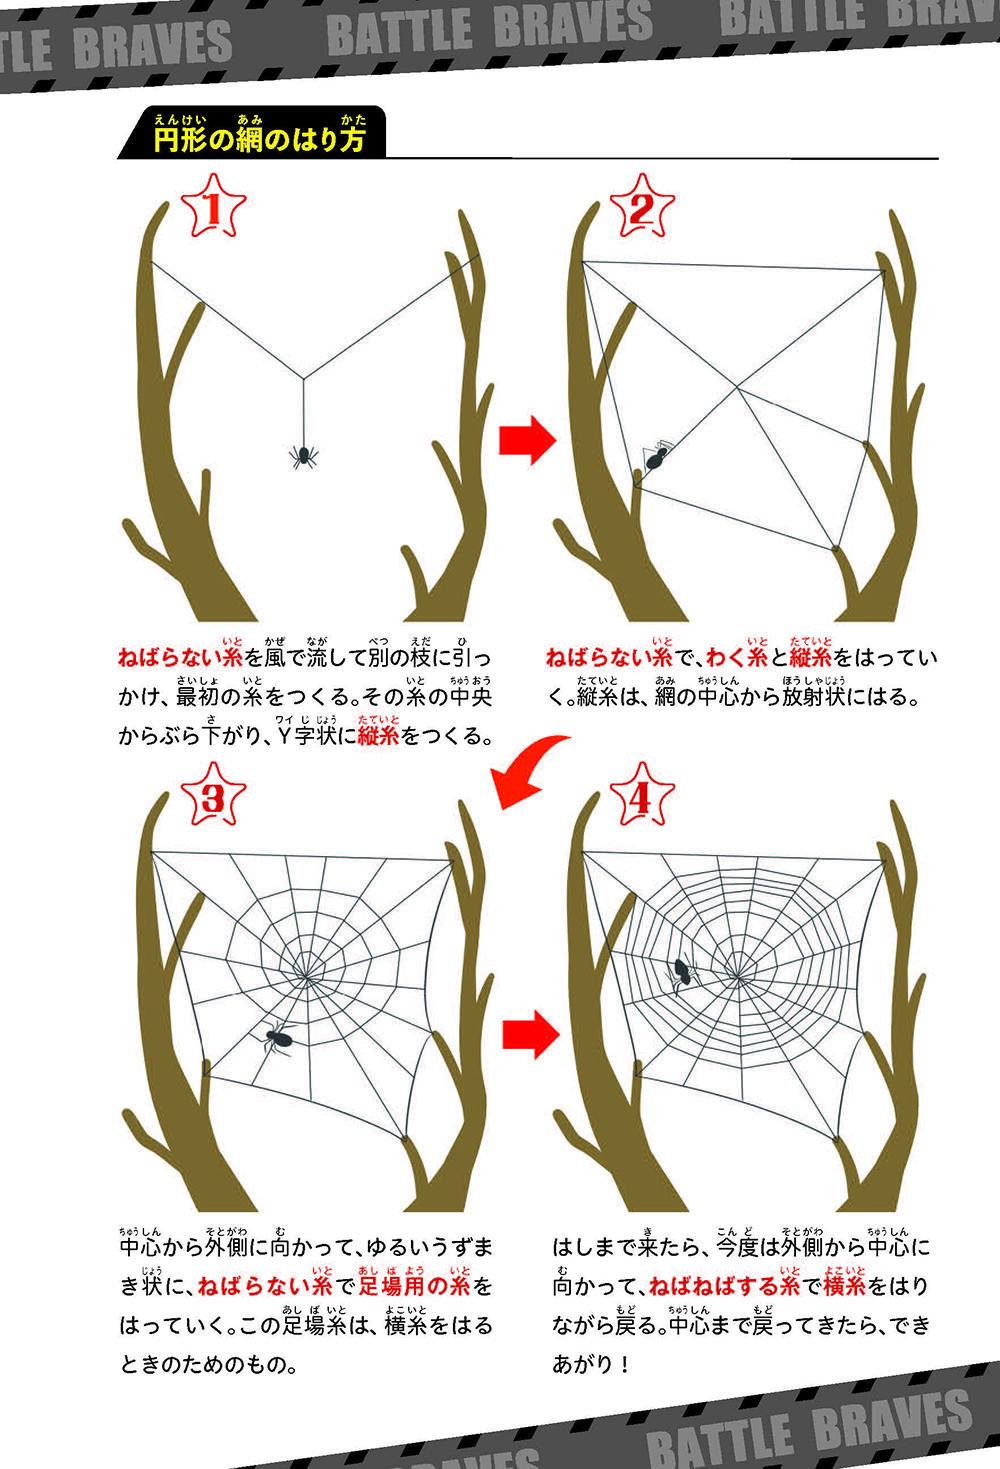 BB_蜊ア髯コ逕溽黄_繝倥z繝シ繧キ繧兩151.jpg